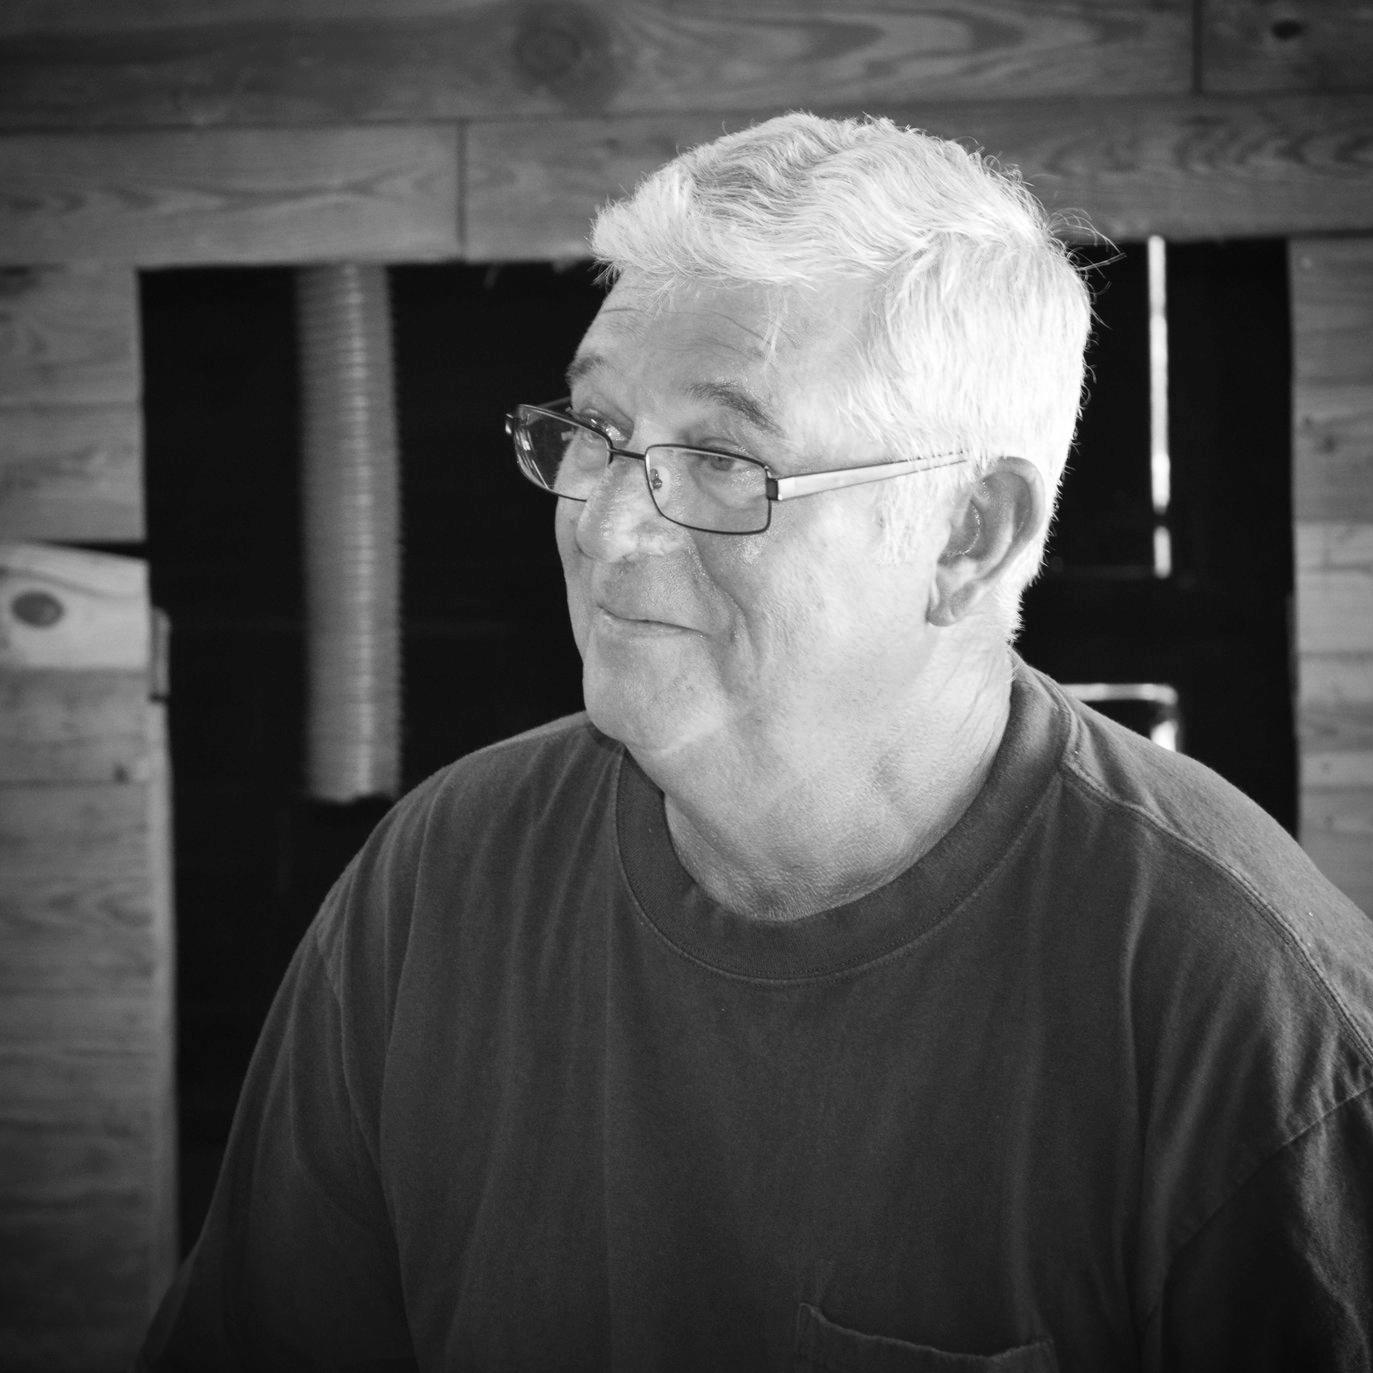 Carolina Farmstead Founder Wayne Noble